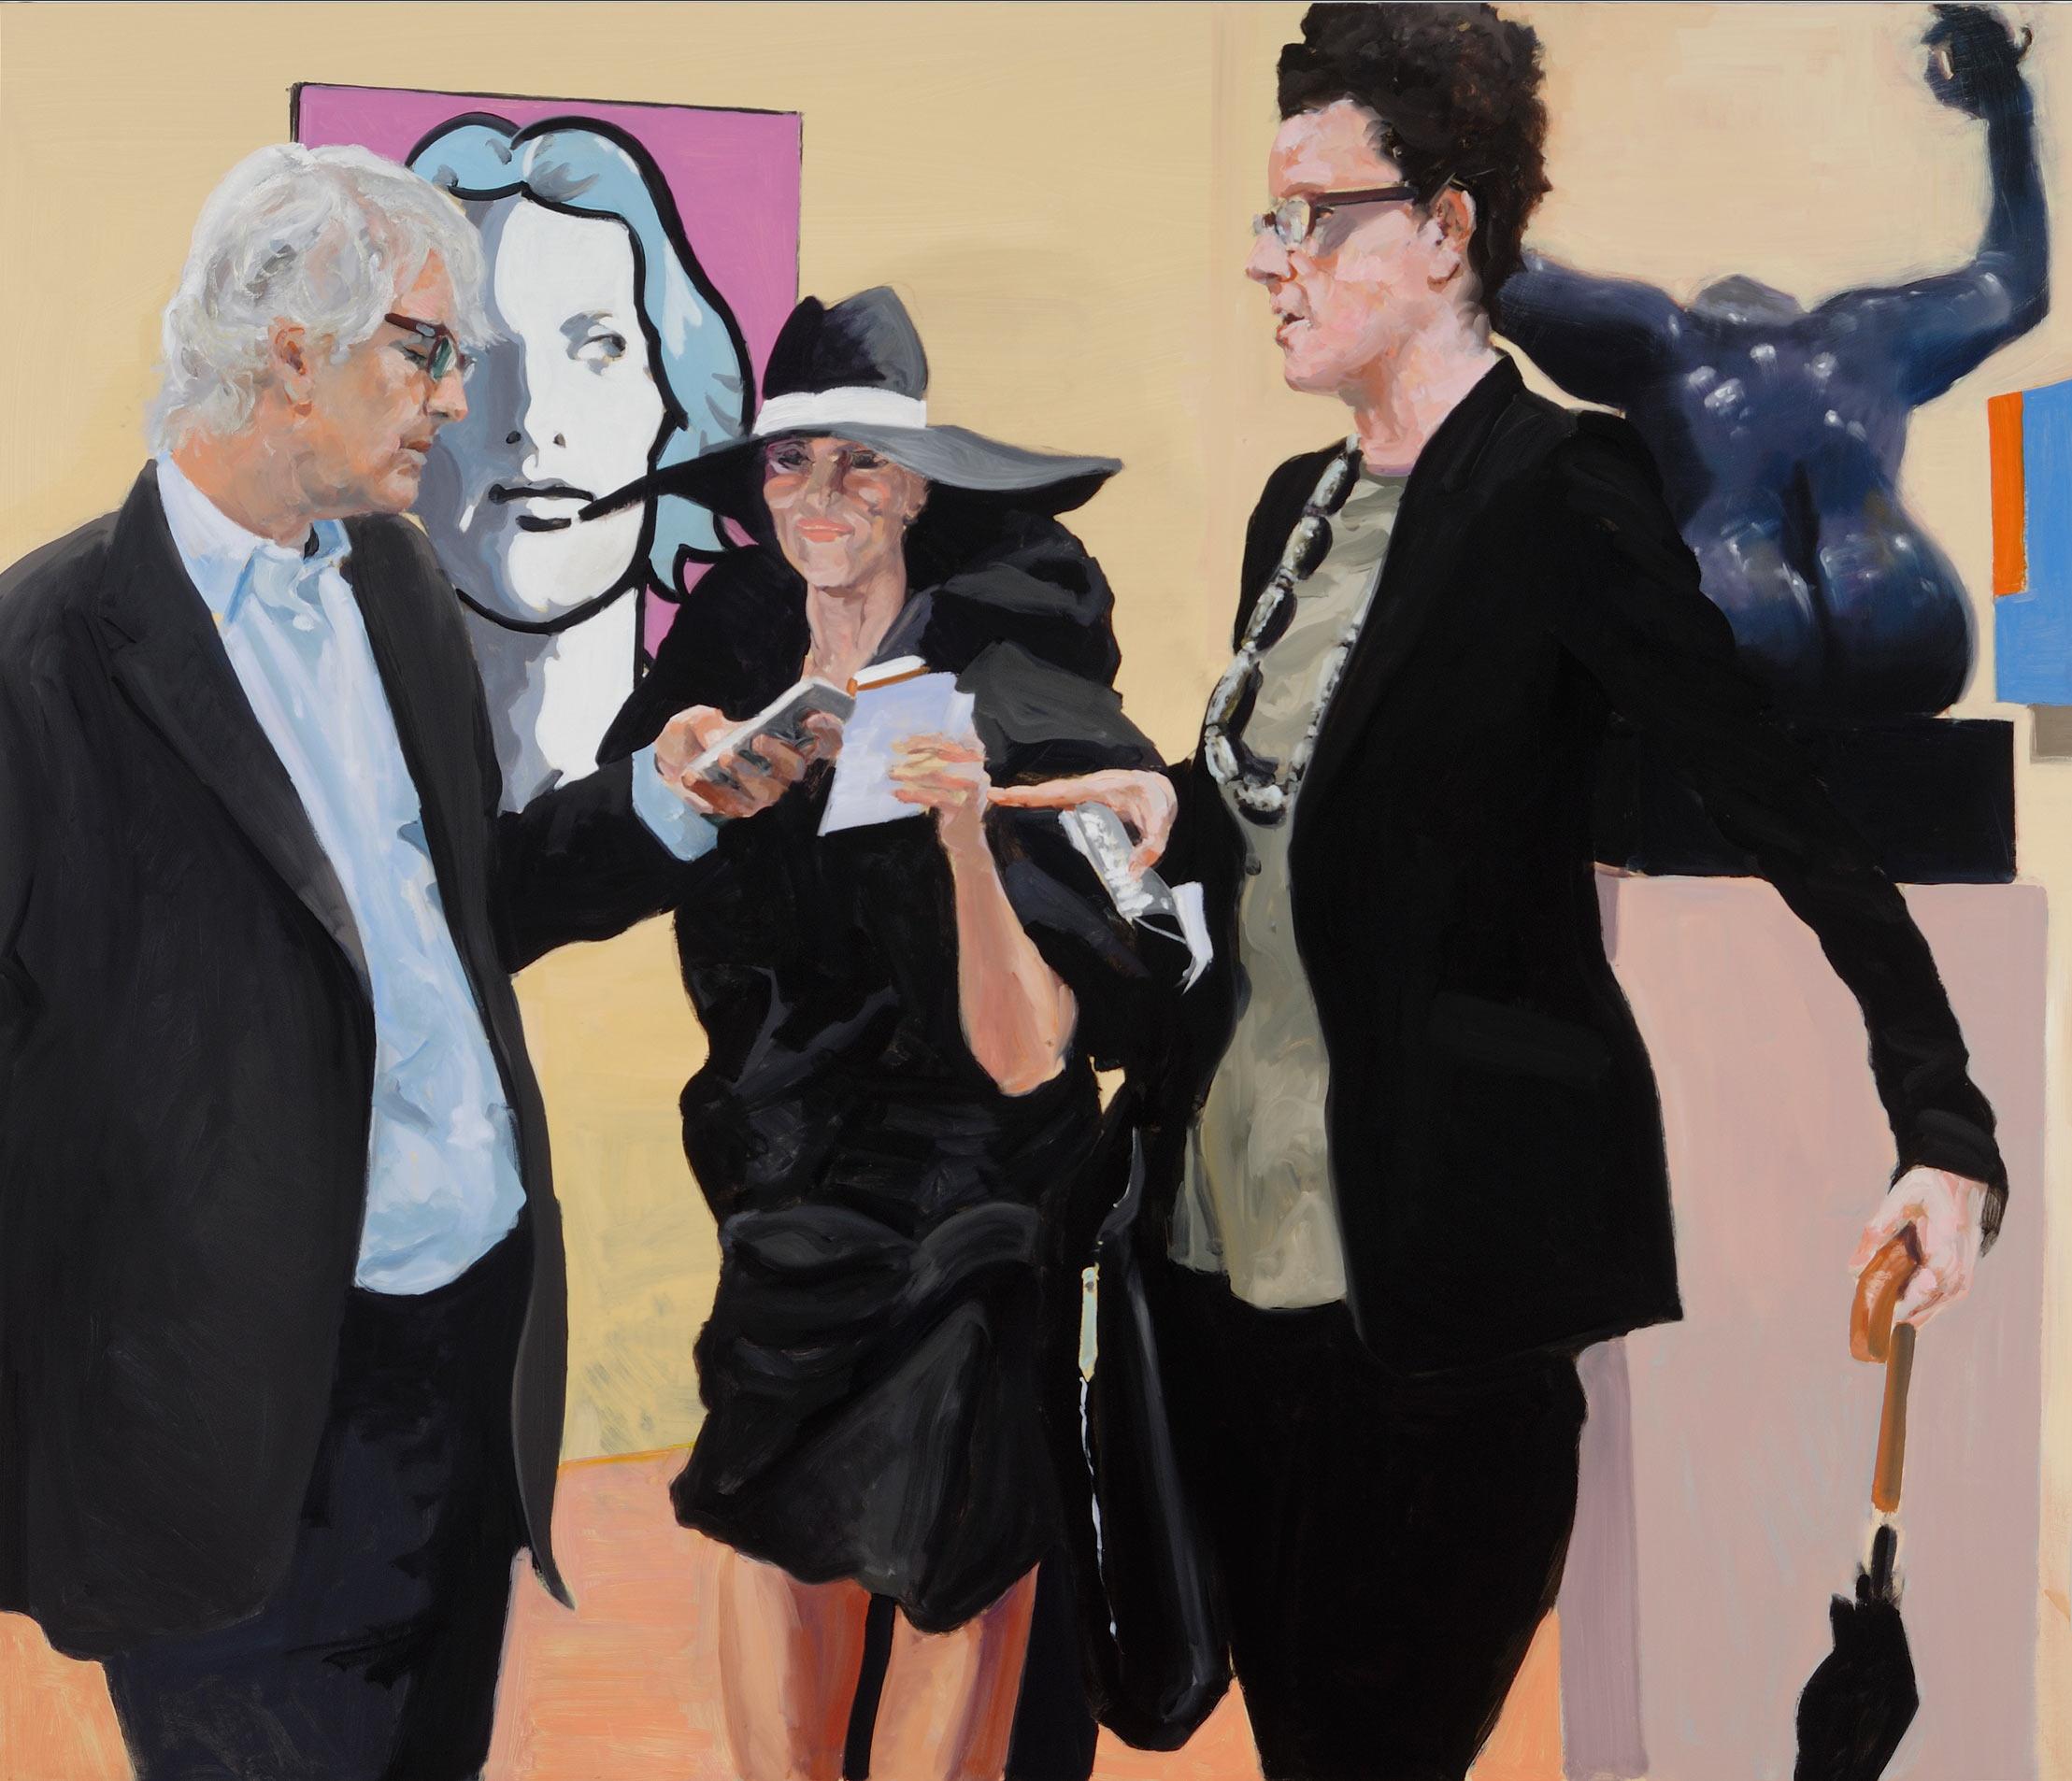 Art Fair: Booth #17 Instructions, 2014. Oil on Linen. 70 x 82 in. (178 x 208 cm.)